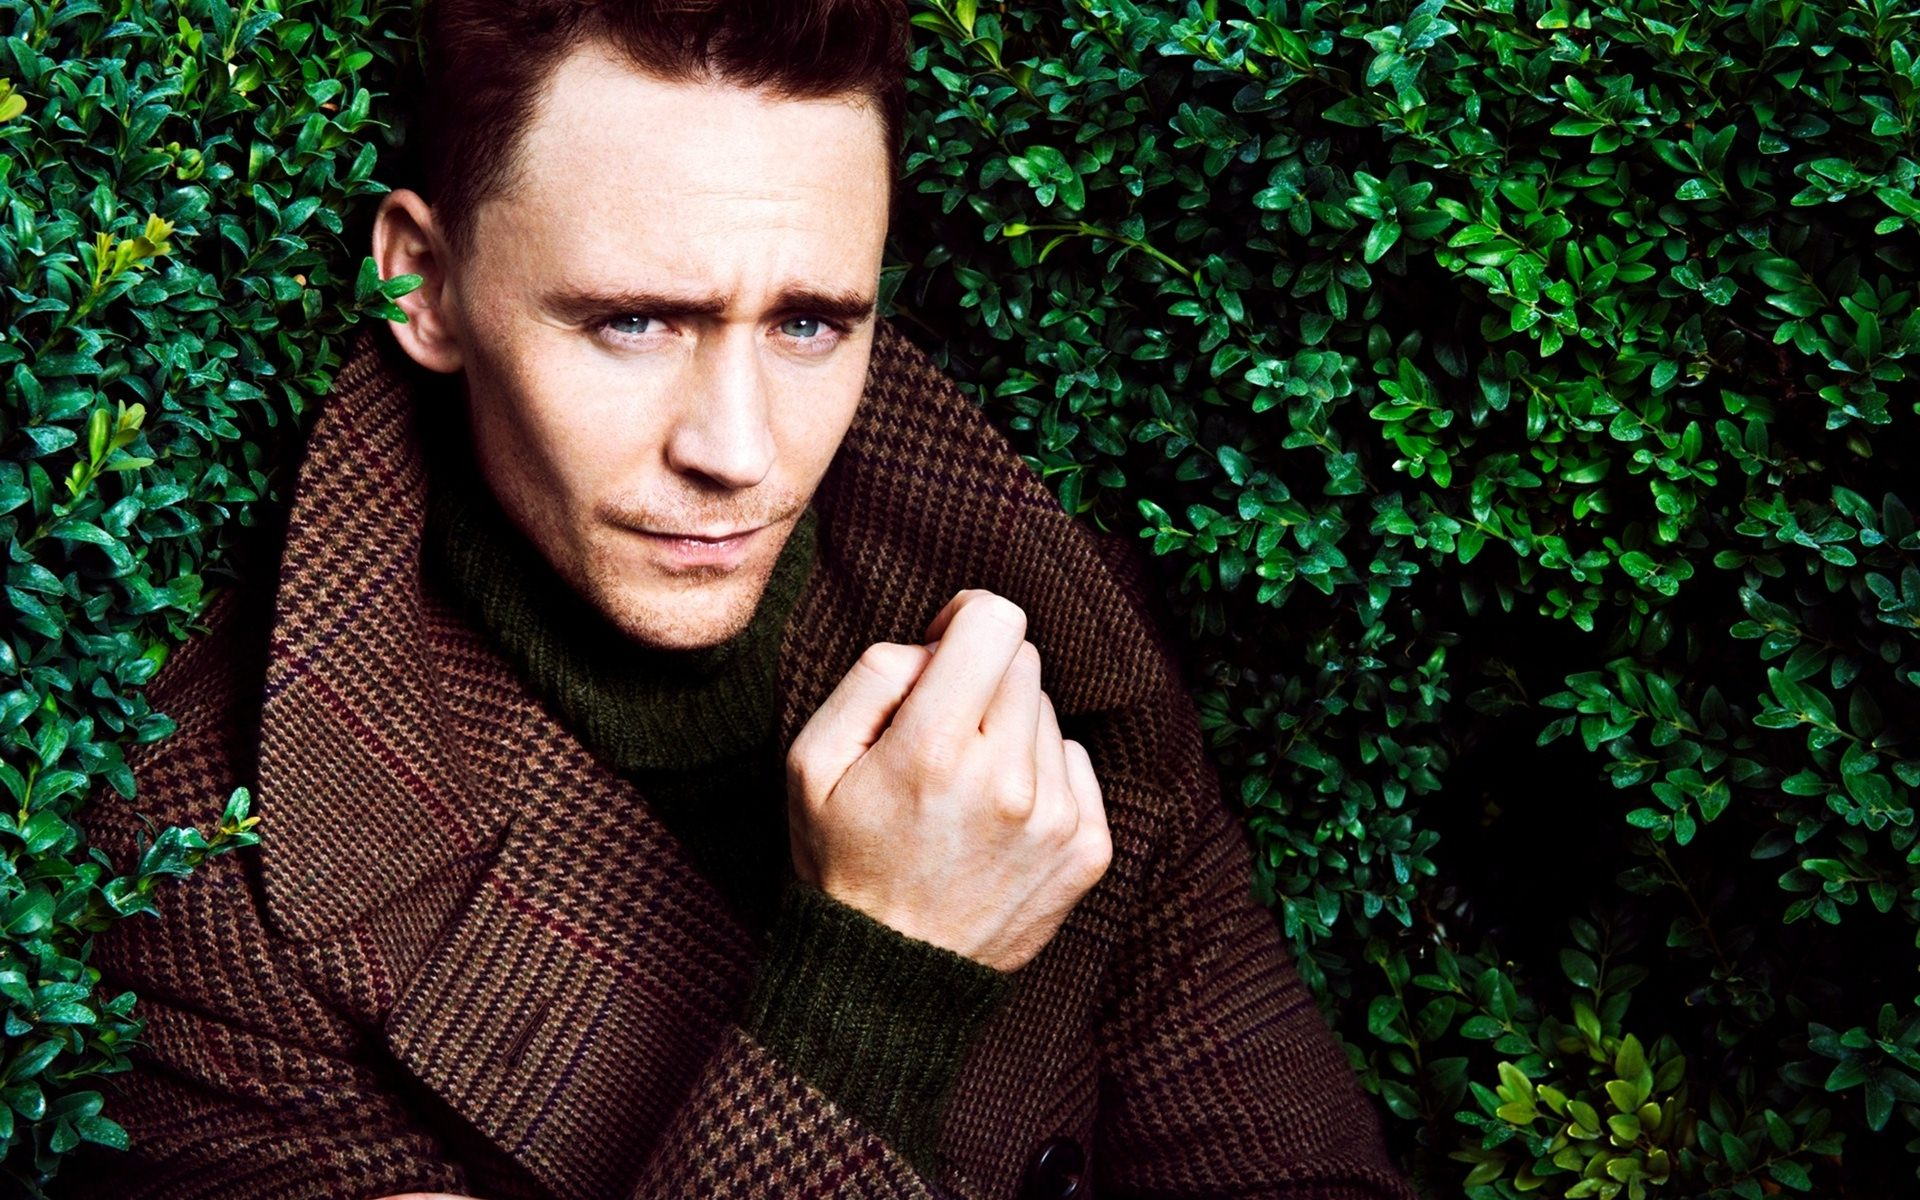 Tom Hiddleston Wallpaper Hd Tom hiddleston 1920x1200